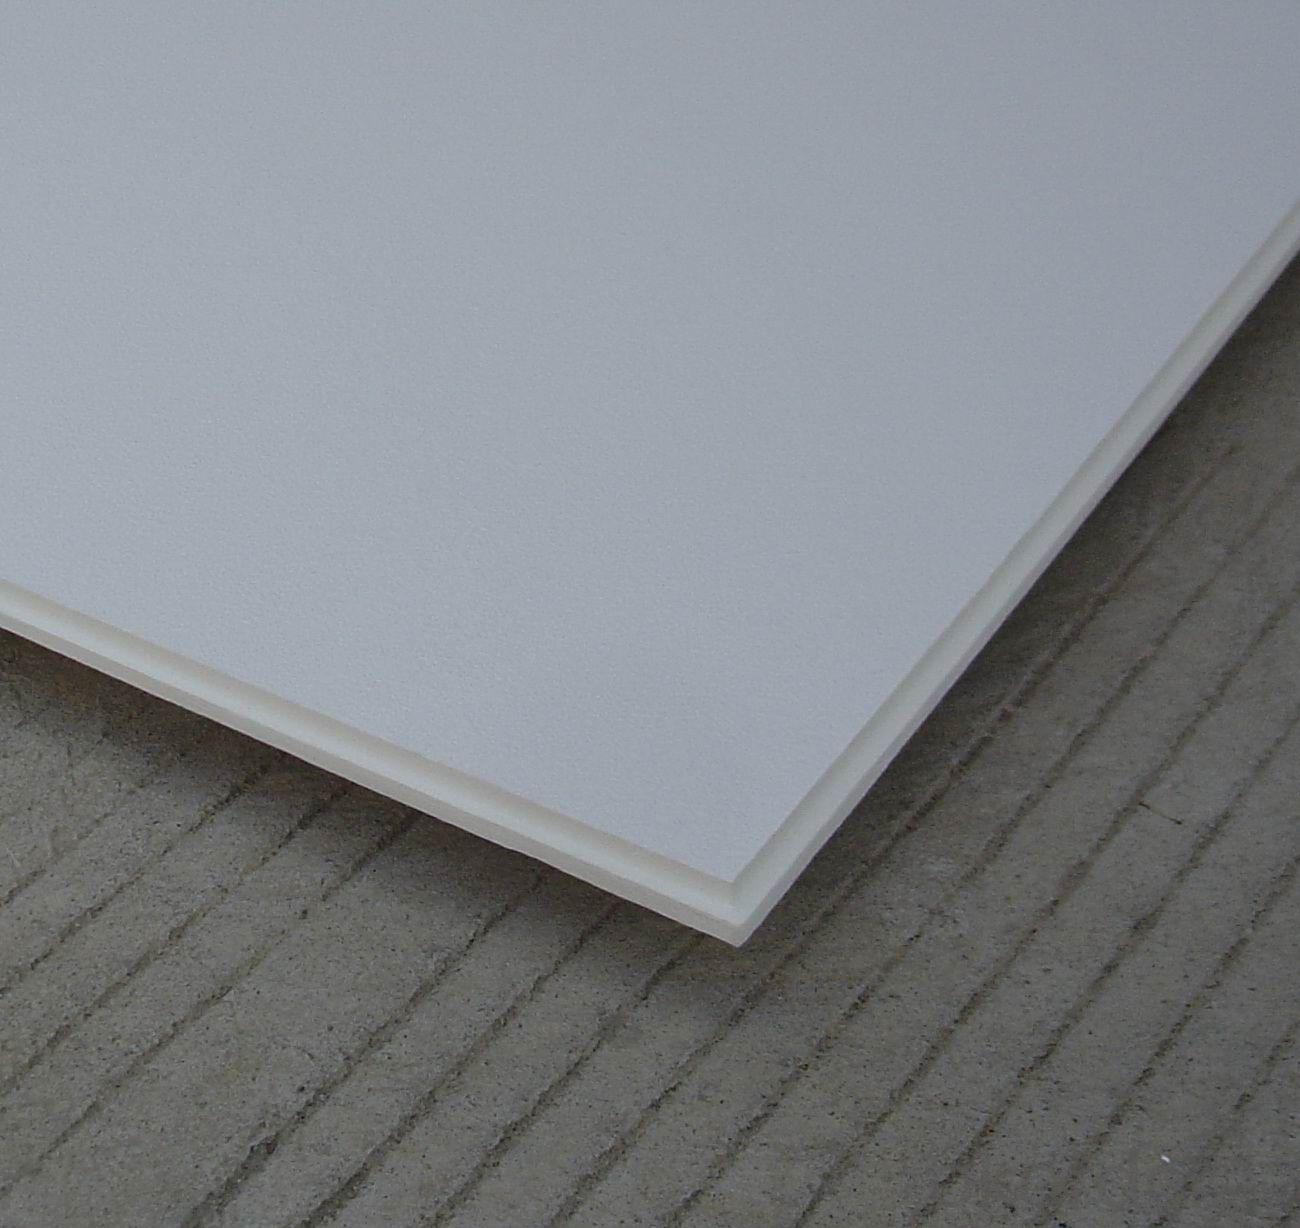 Buy Fiberglass Acoustic Ceiling Density 120k Hot Sale